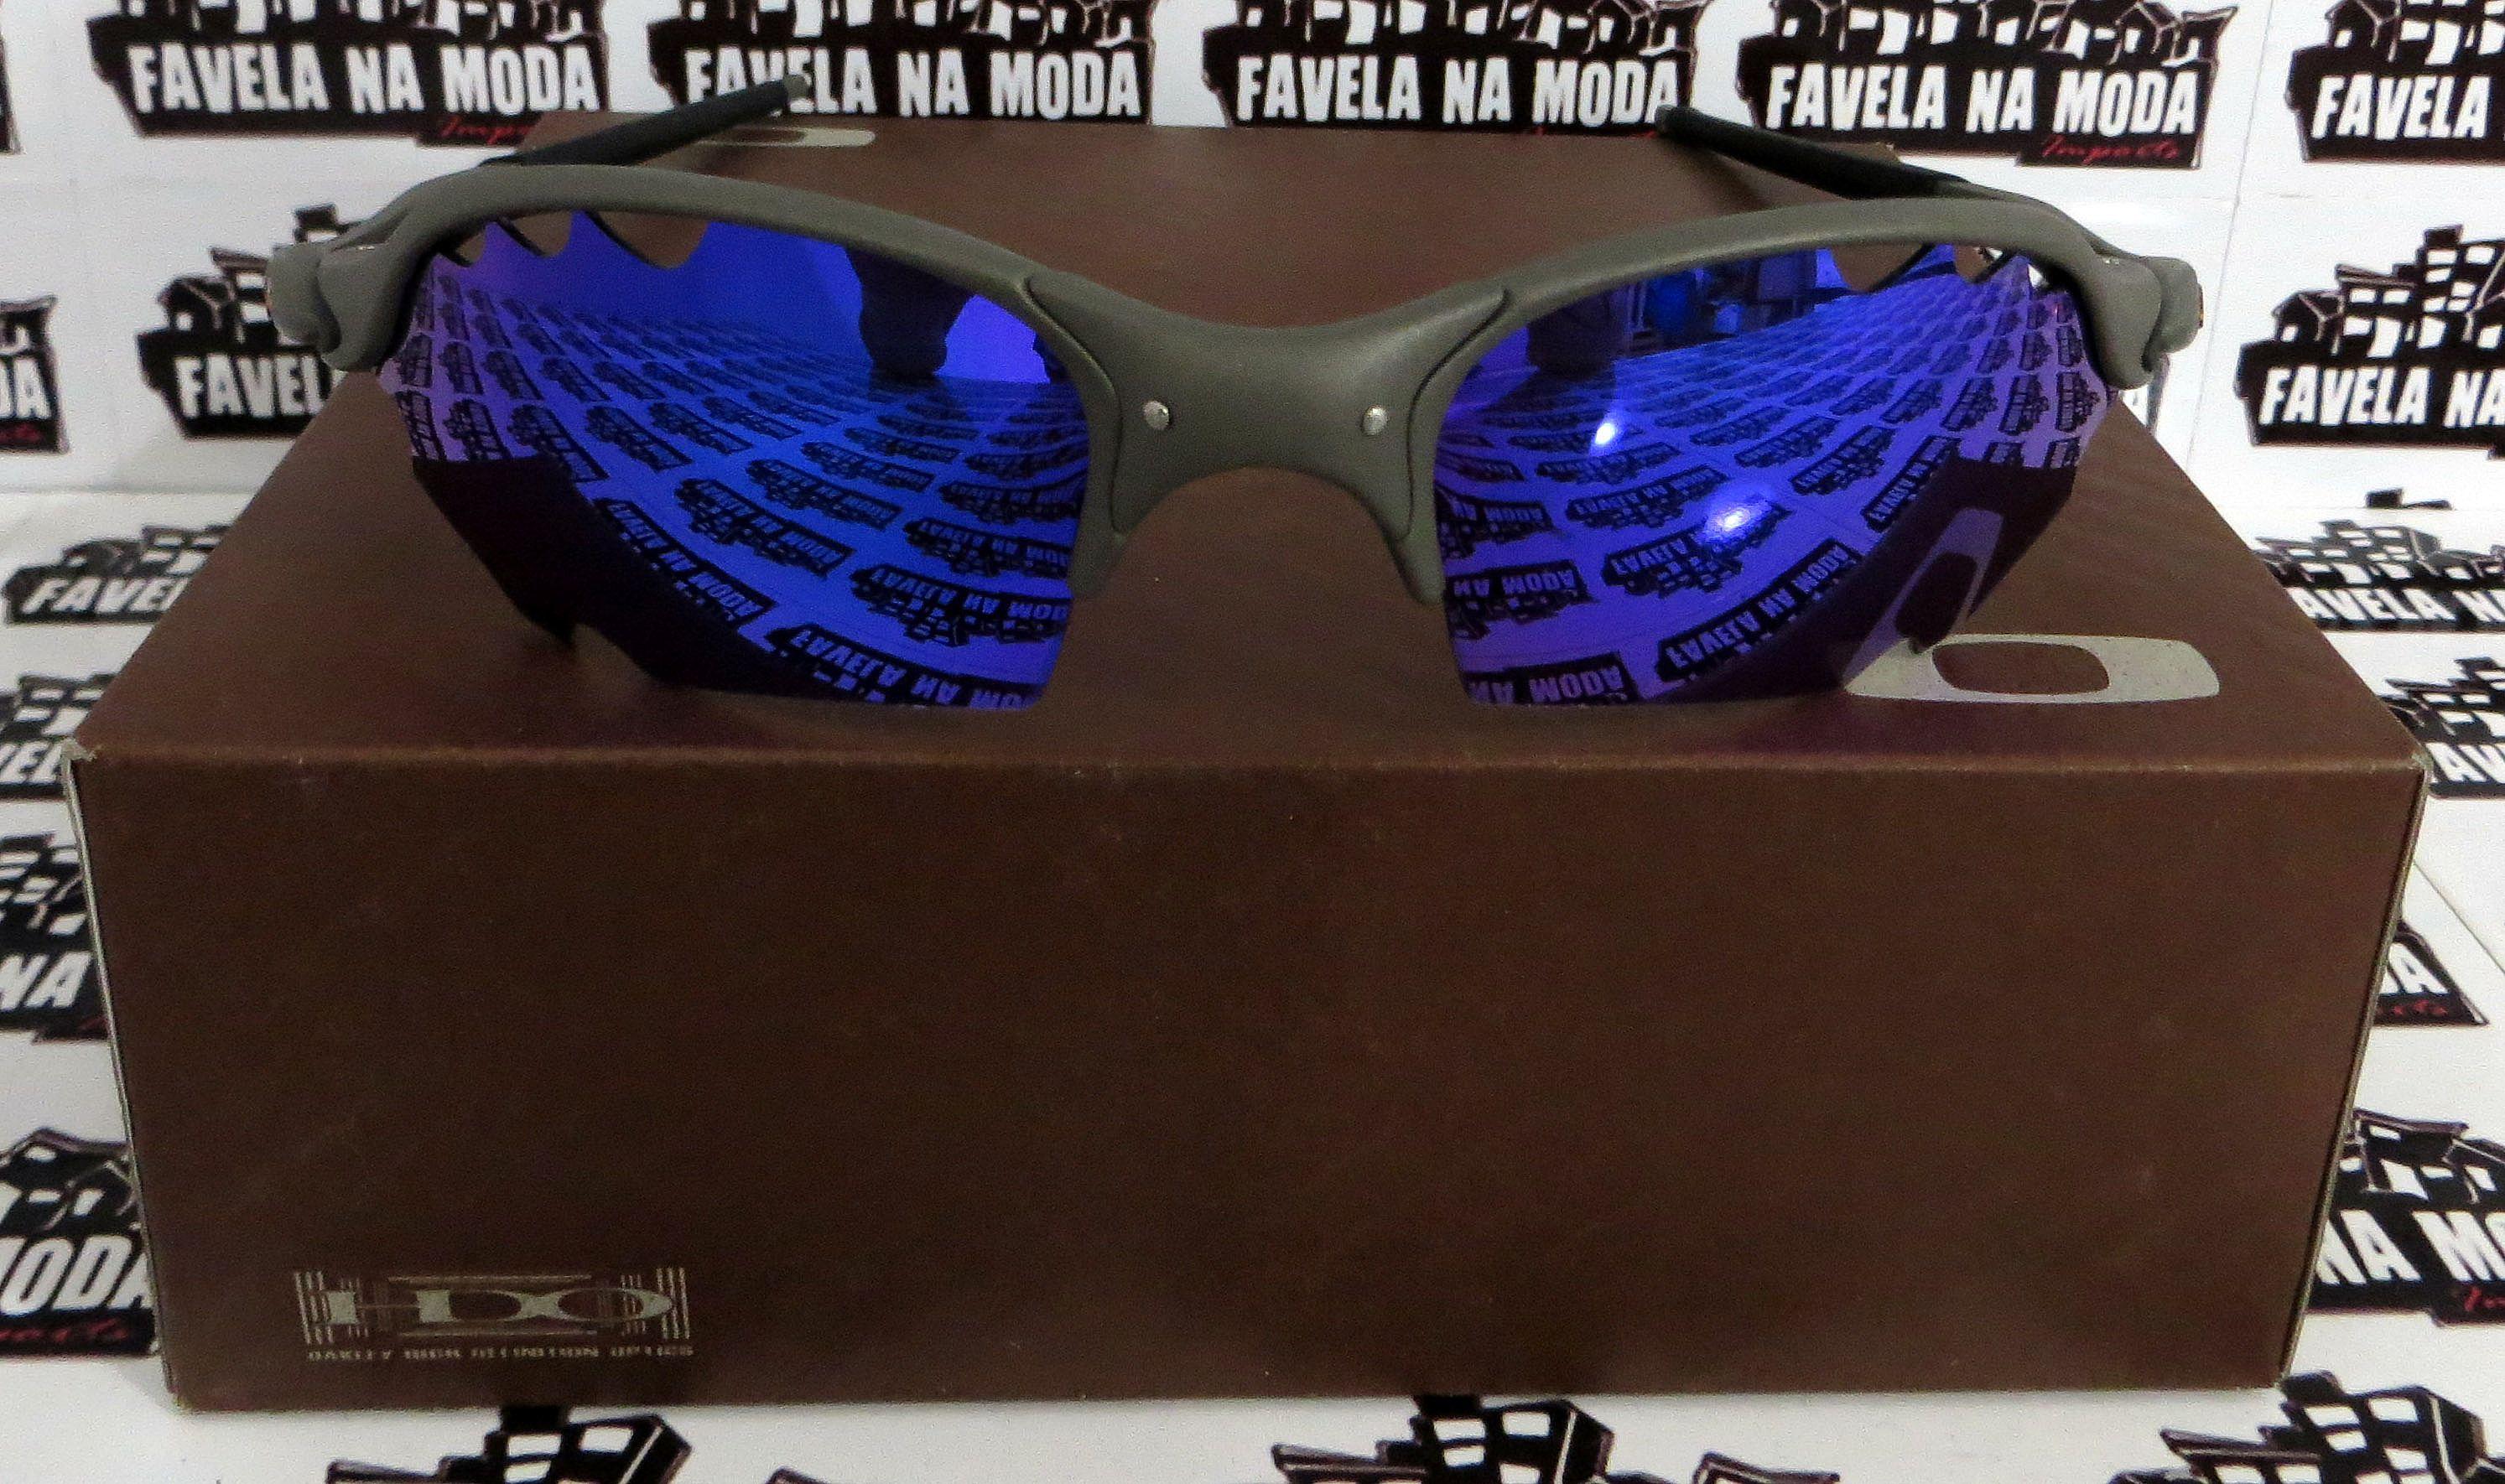 cad3432cae96d Óculos Oakley Romeo 2 - X-Metal   Blue Neon (Parriot)